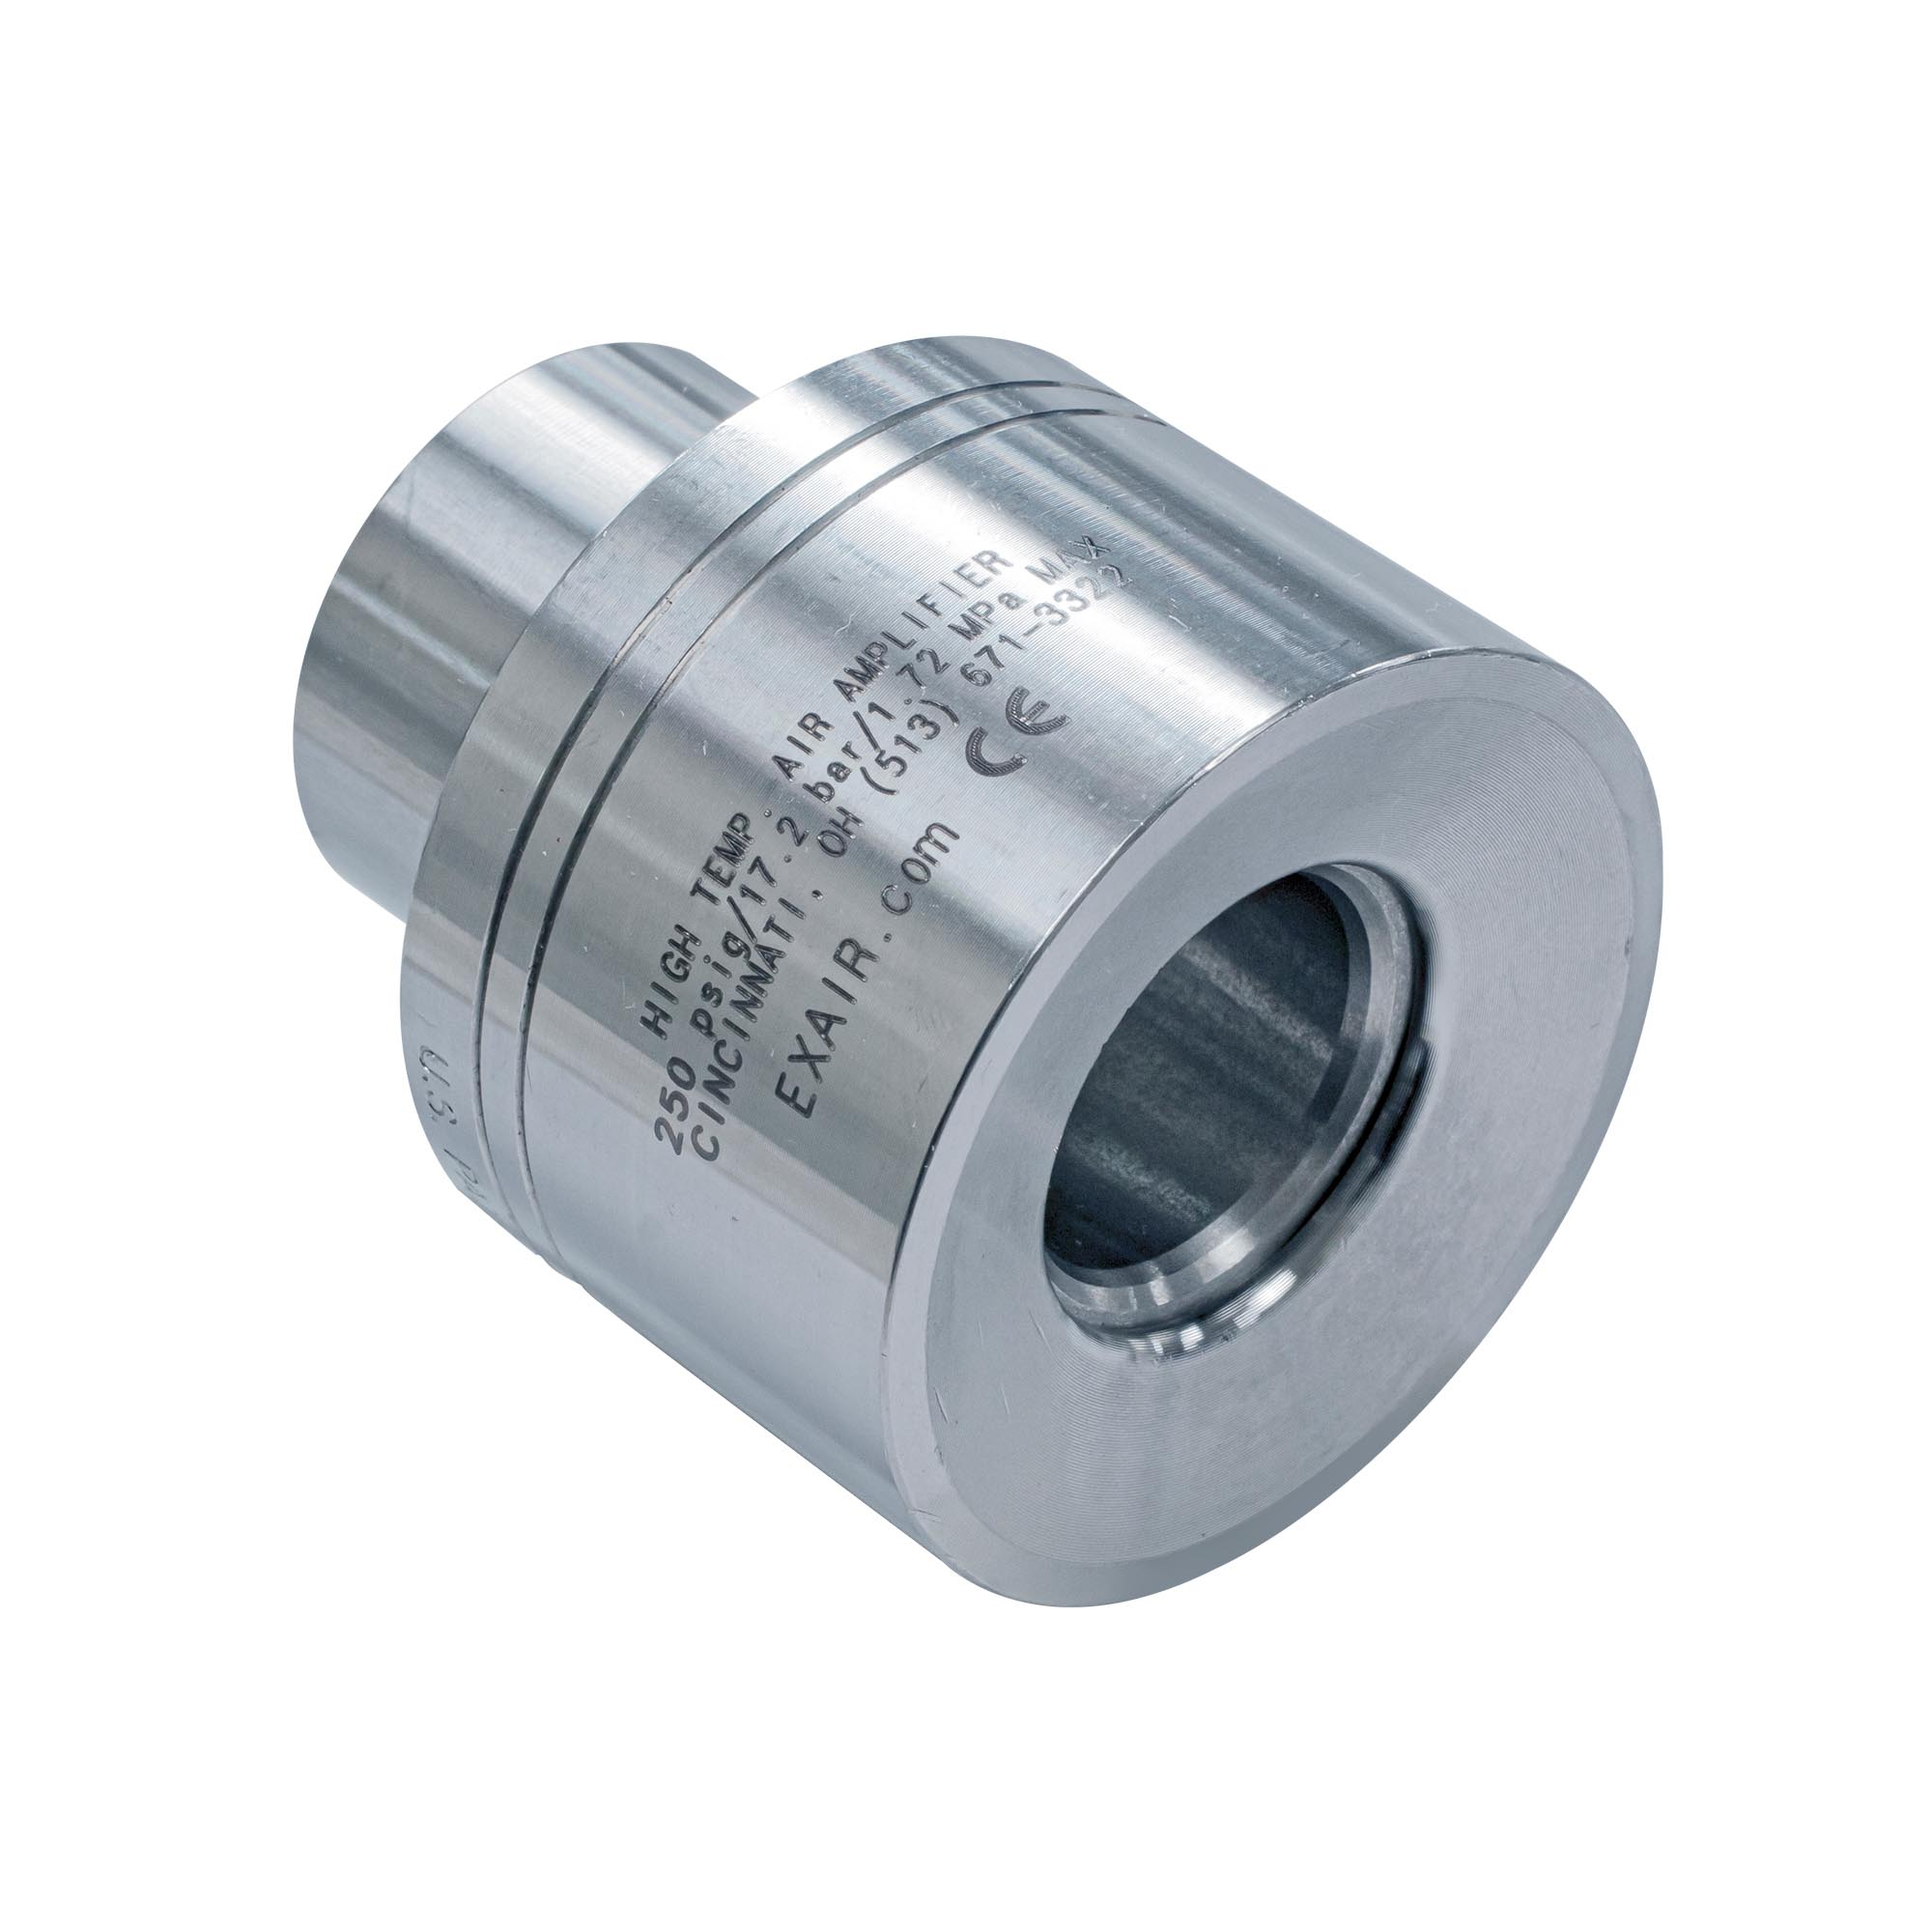 "Model 121021 1-1/4"" Alum. High Temperature Air Amplifier"